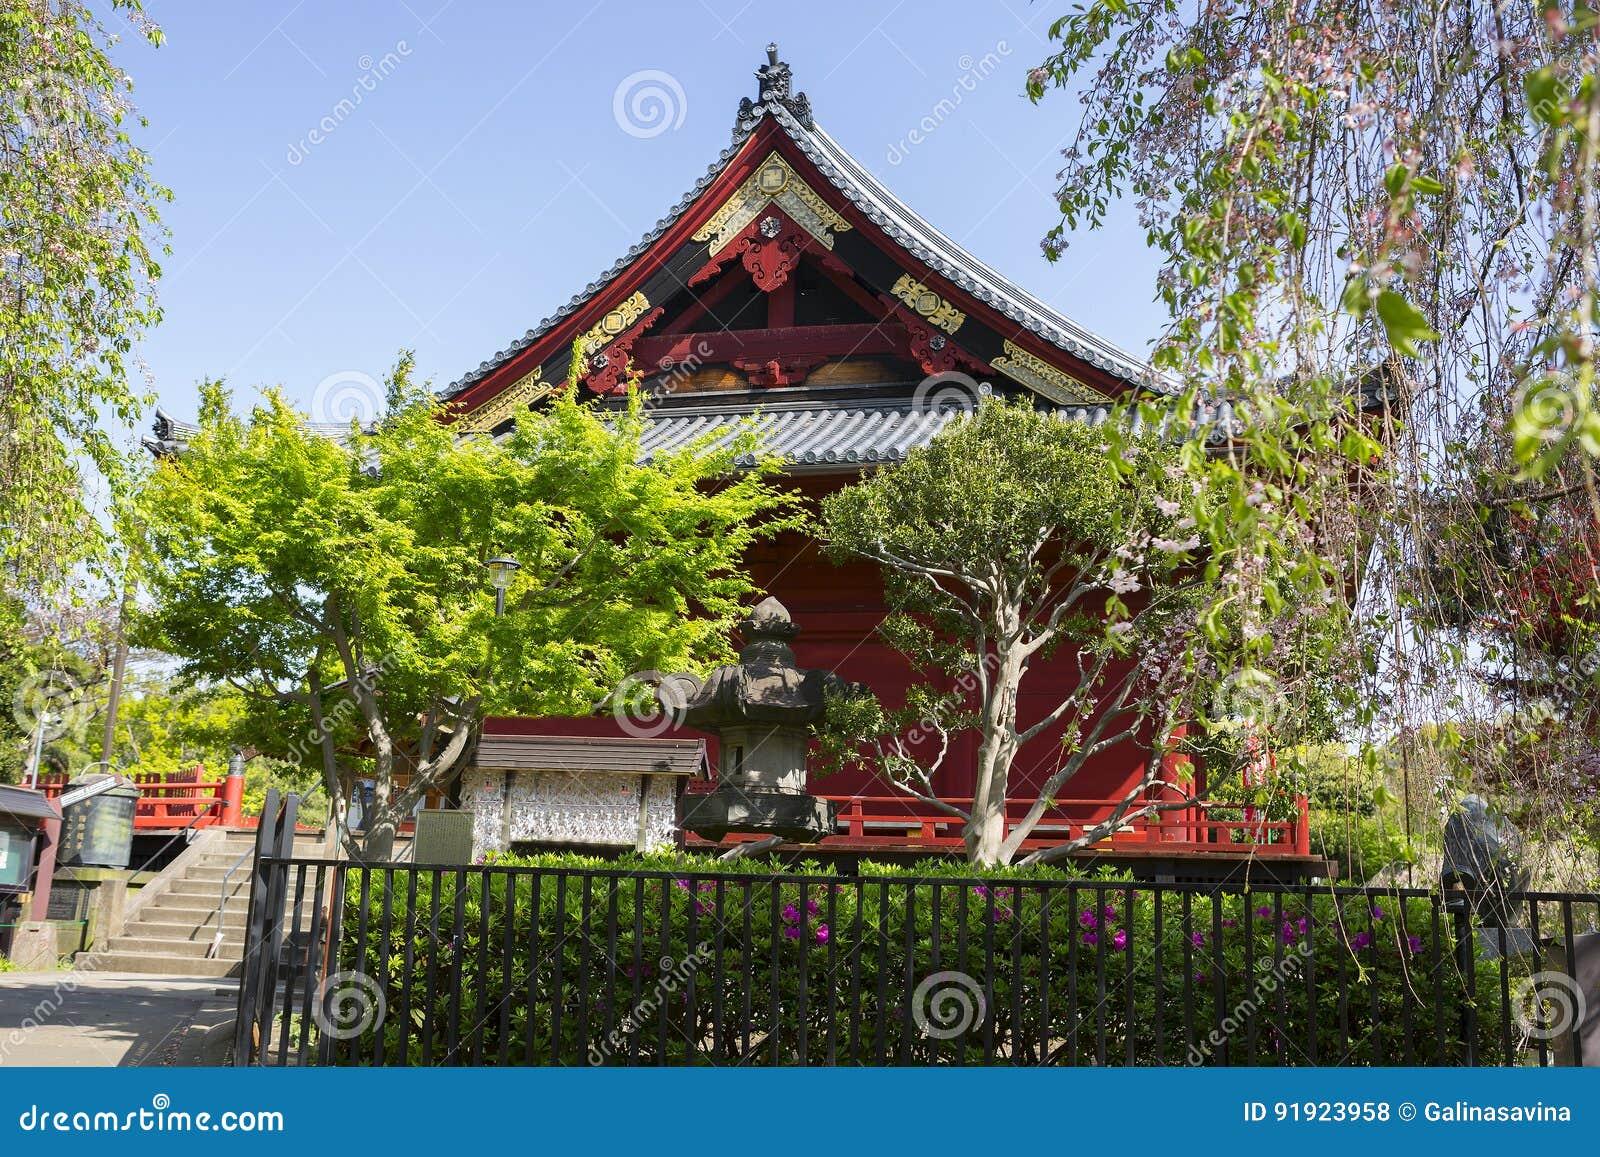 Japan. Tokyo. Temple in Ueno Park.